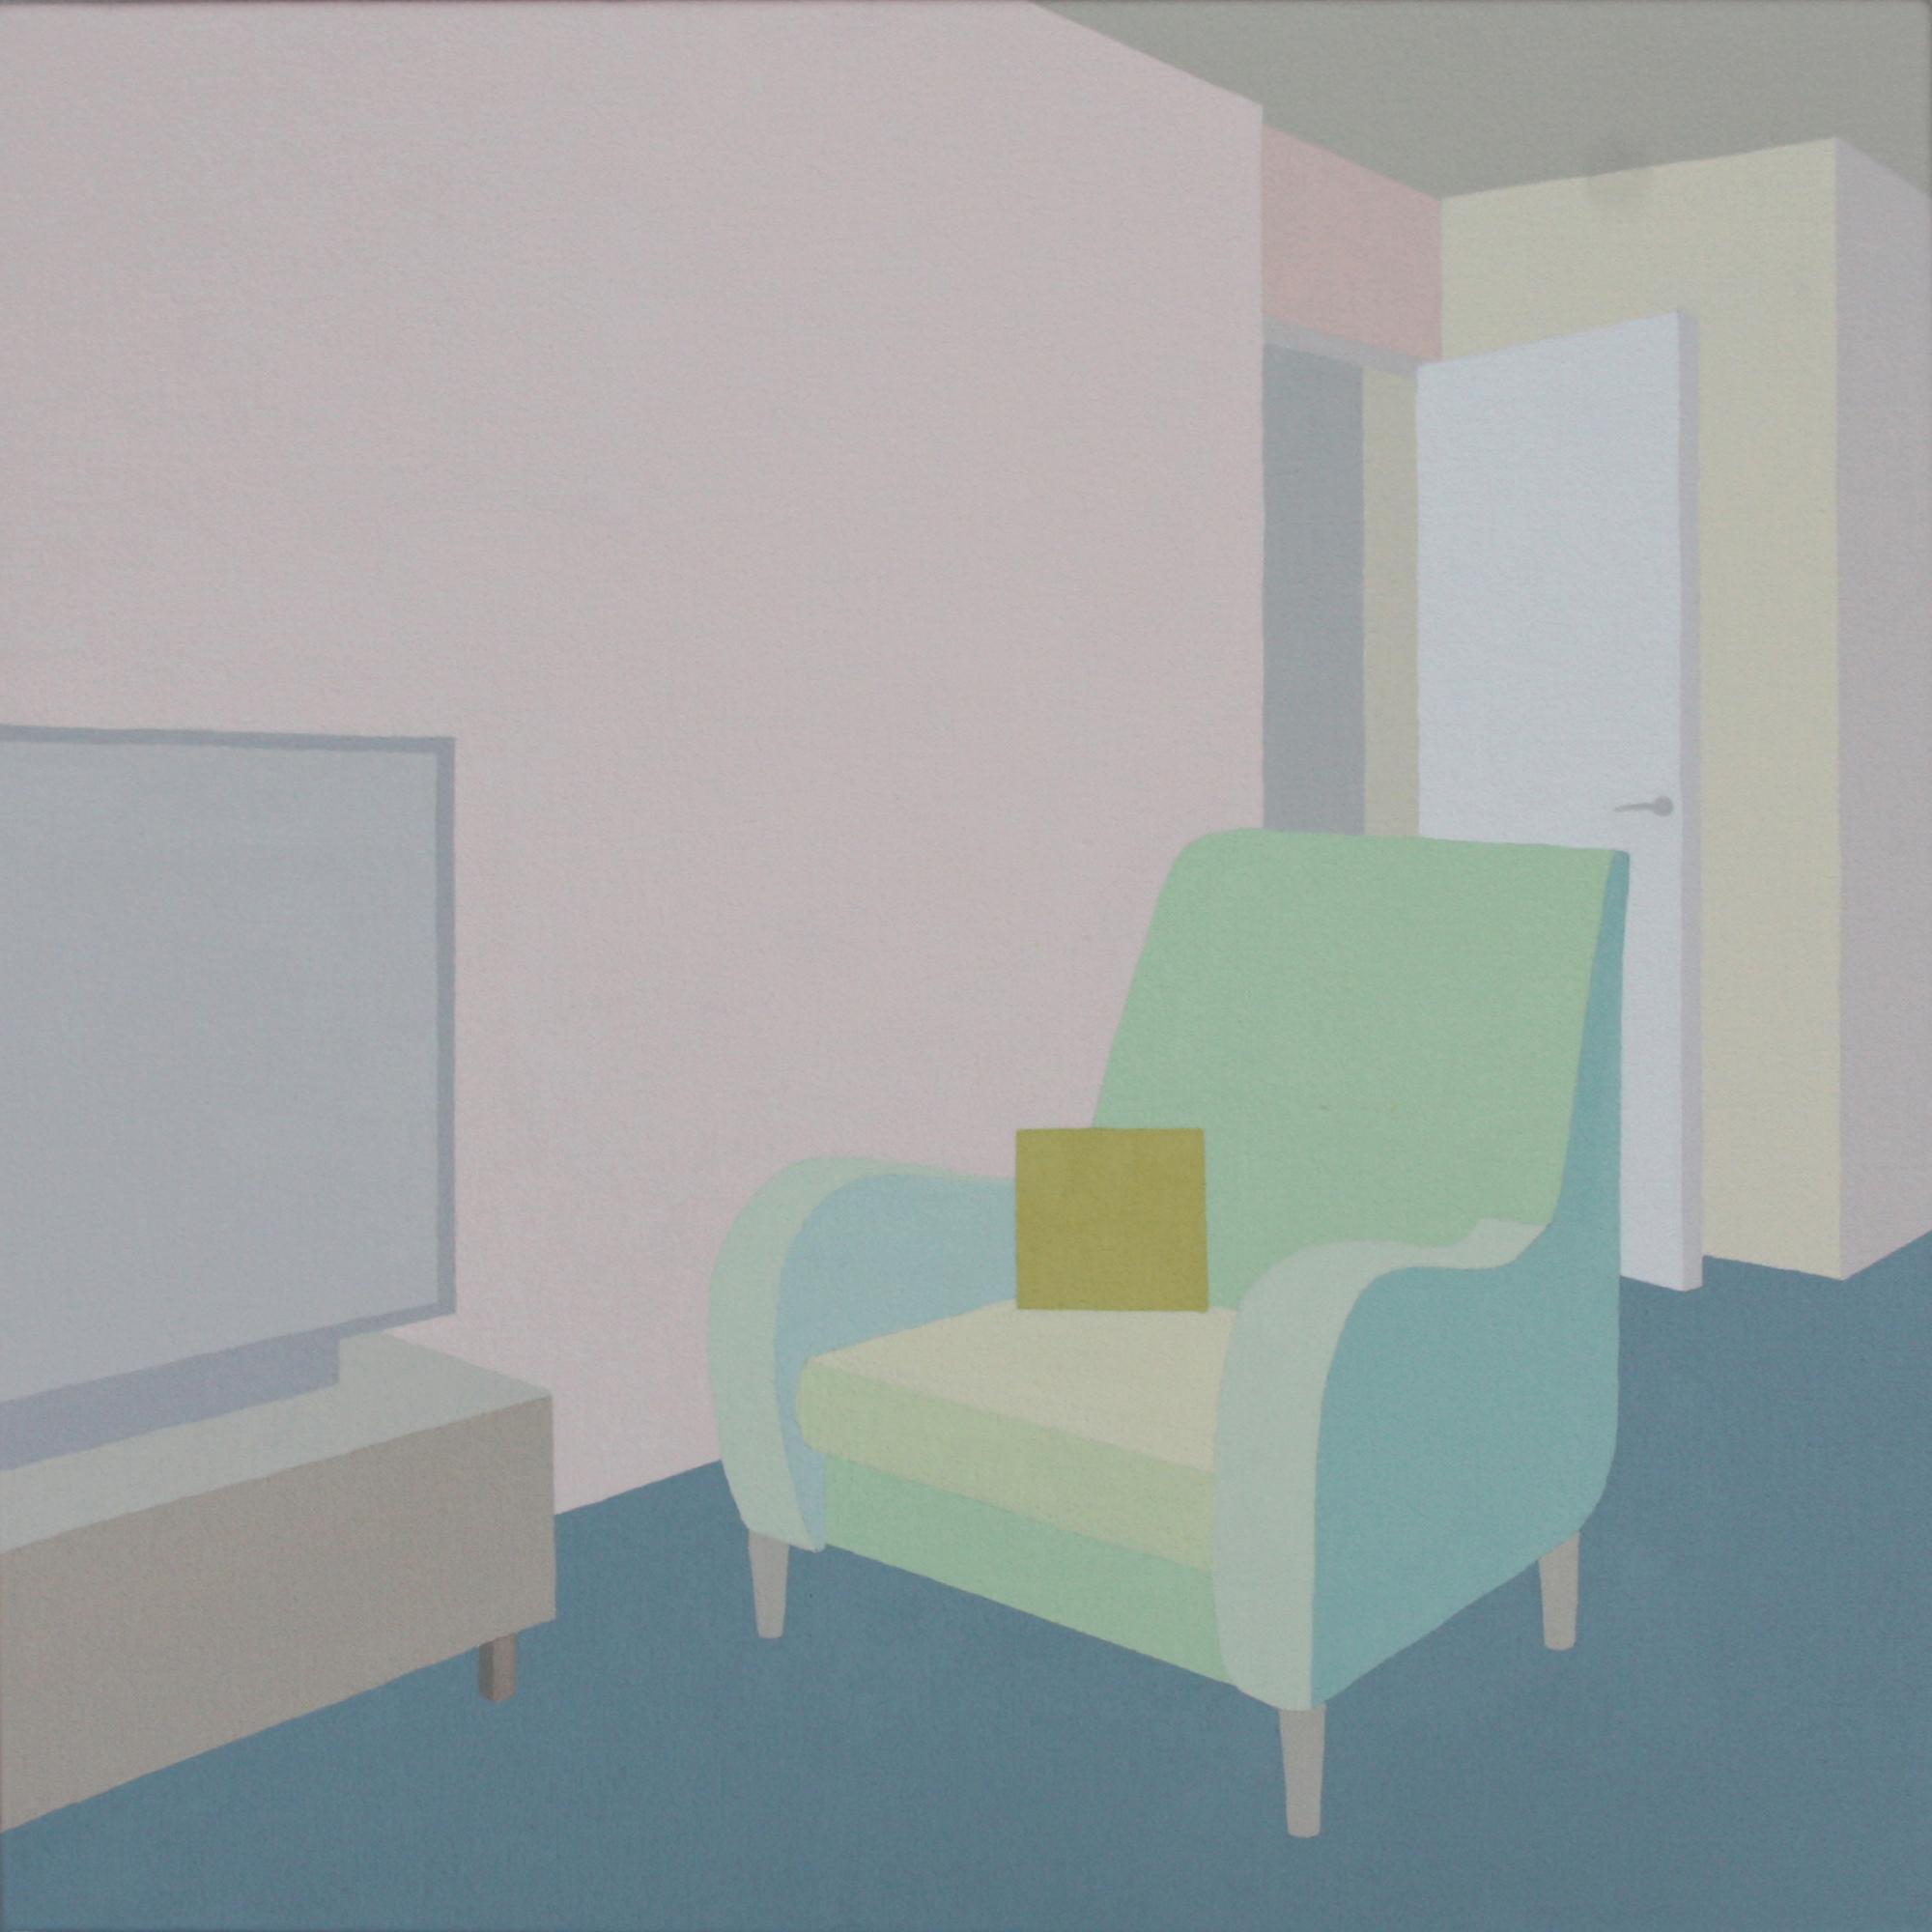 Schweger, Zsofia-Bow, London #2-2017-acrylic on canvas-19.7x19.7in-50x50cm.jpg